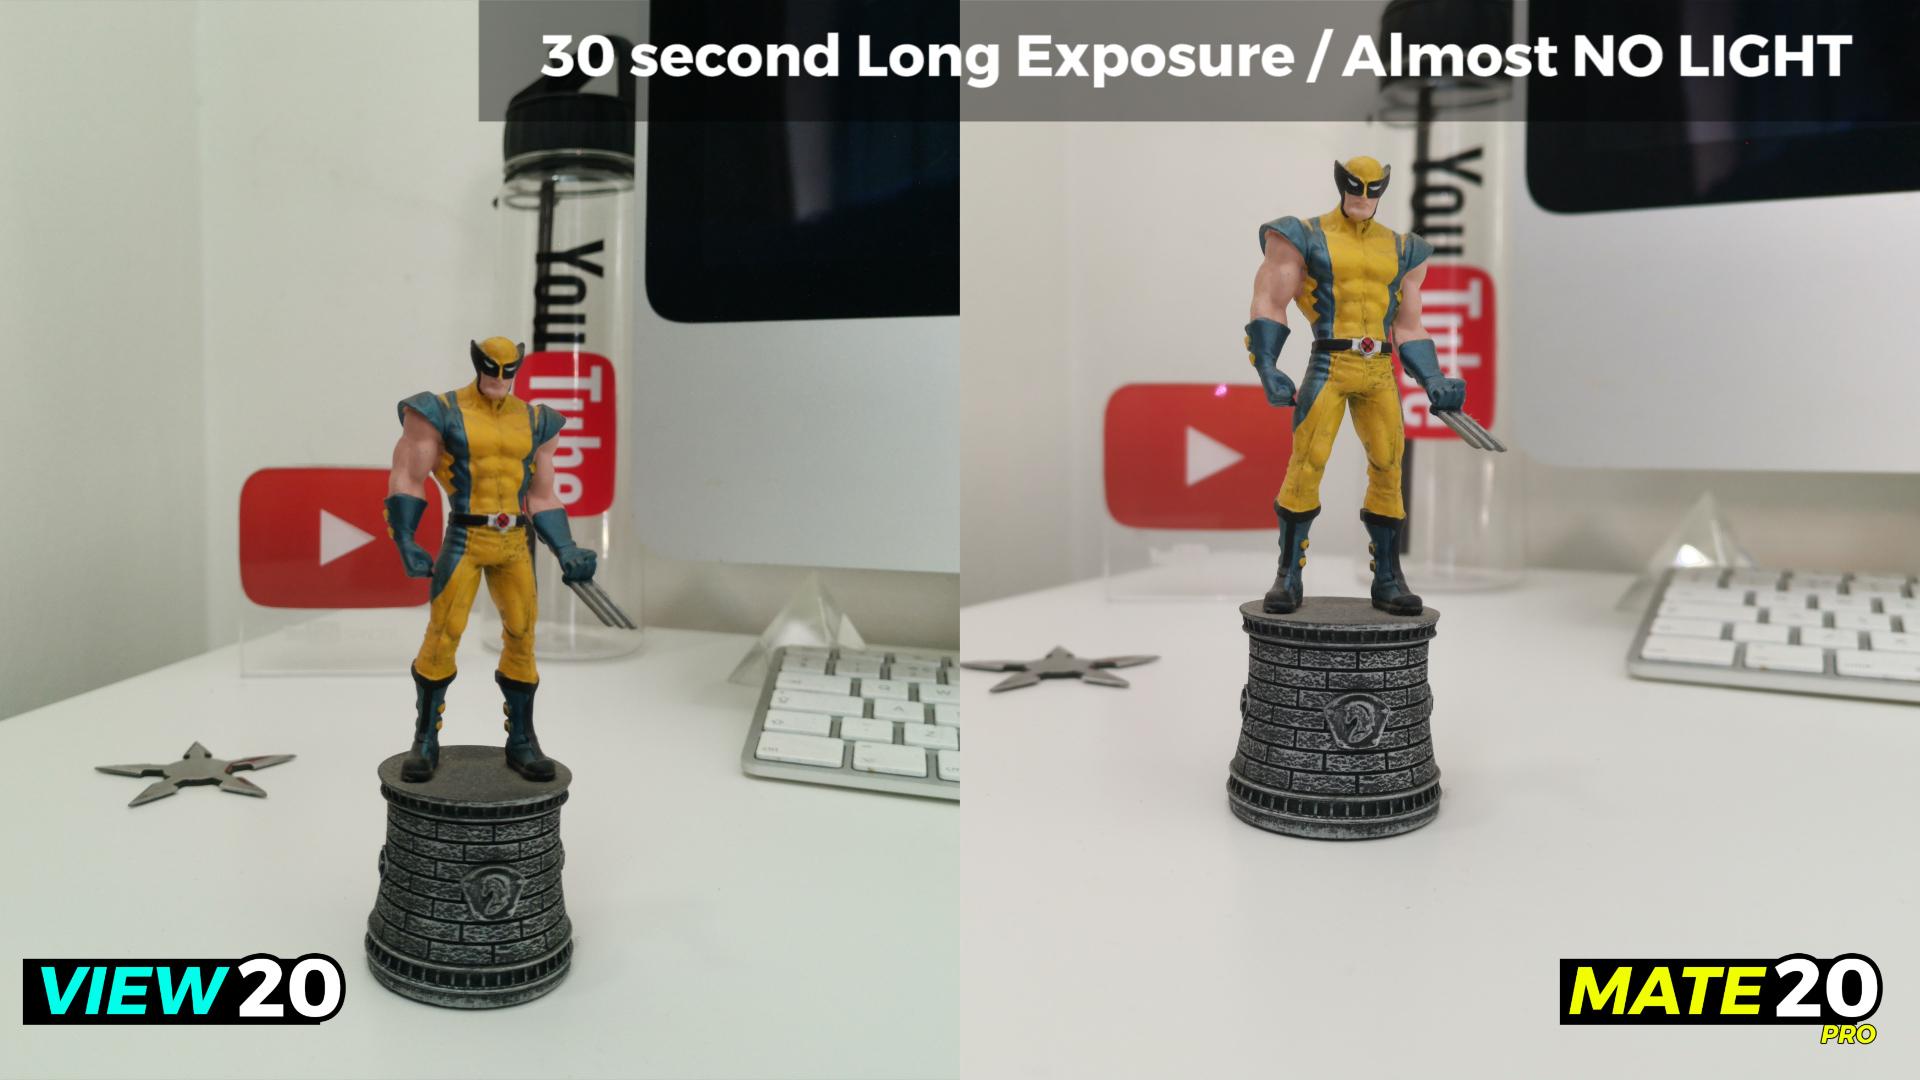 30 long exposure | NO LIGHT